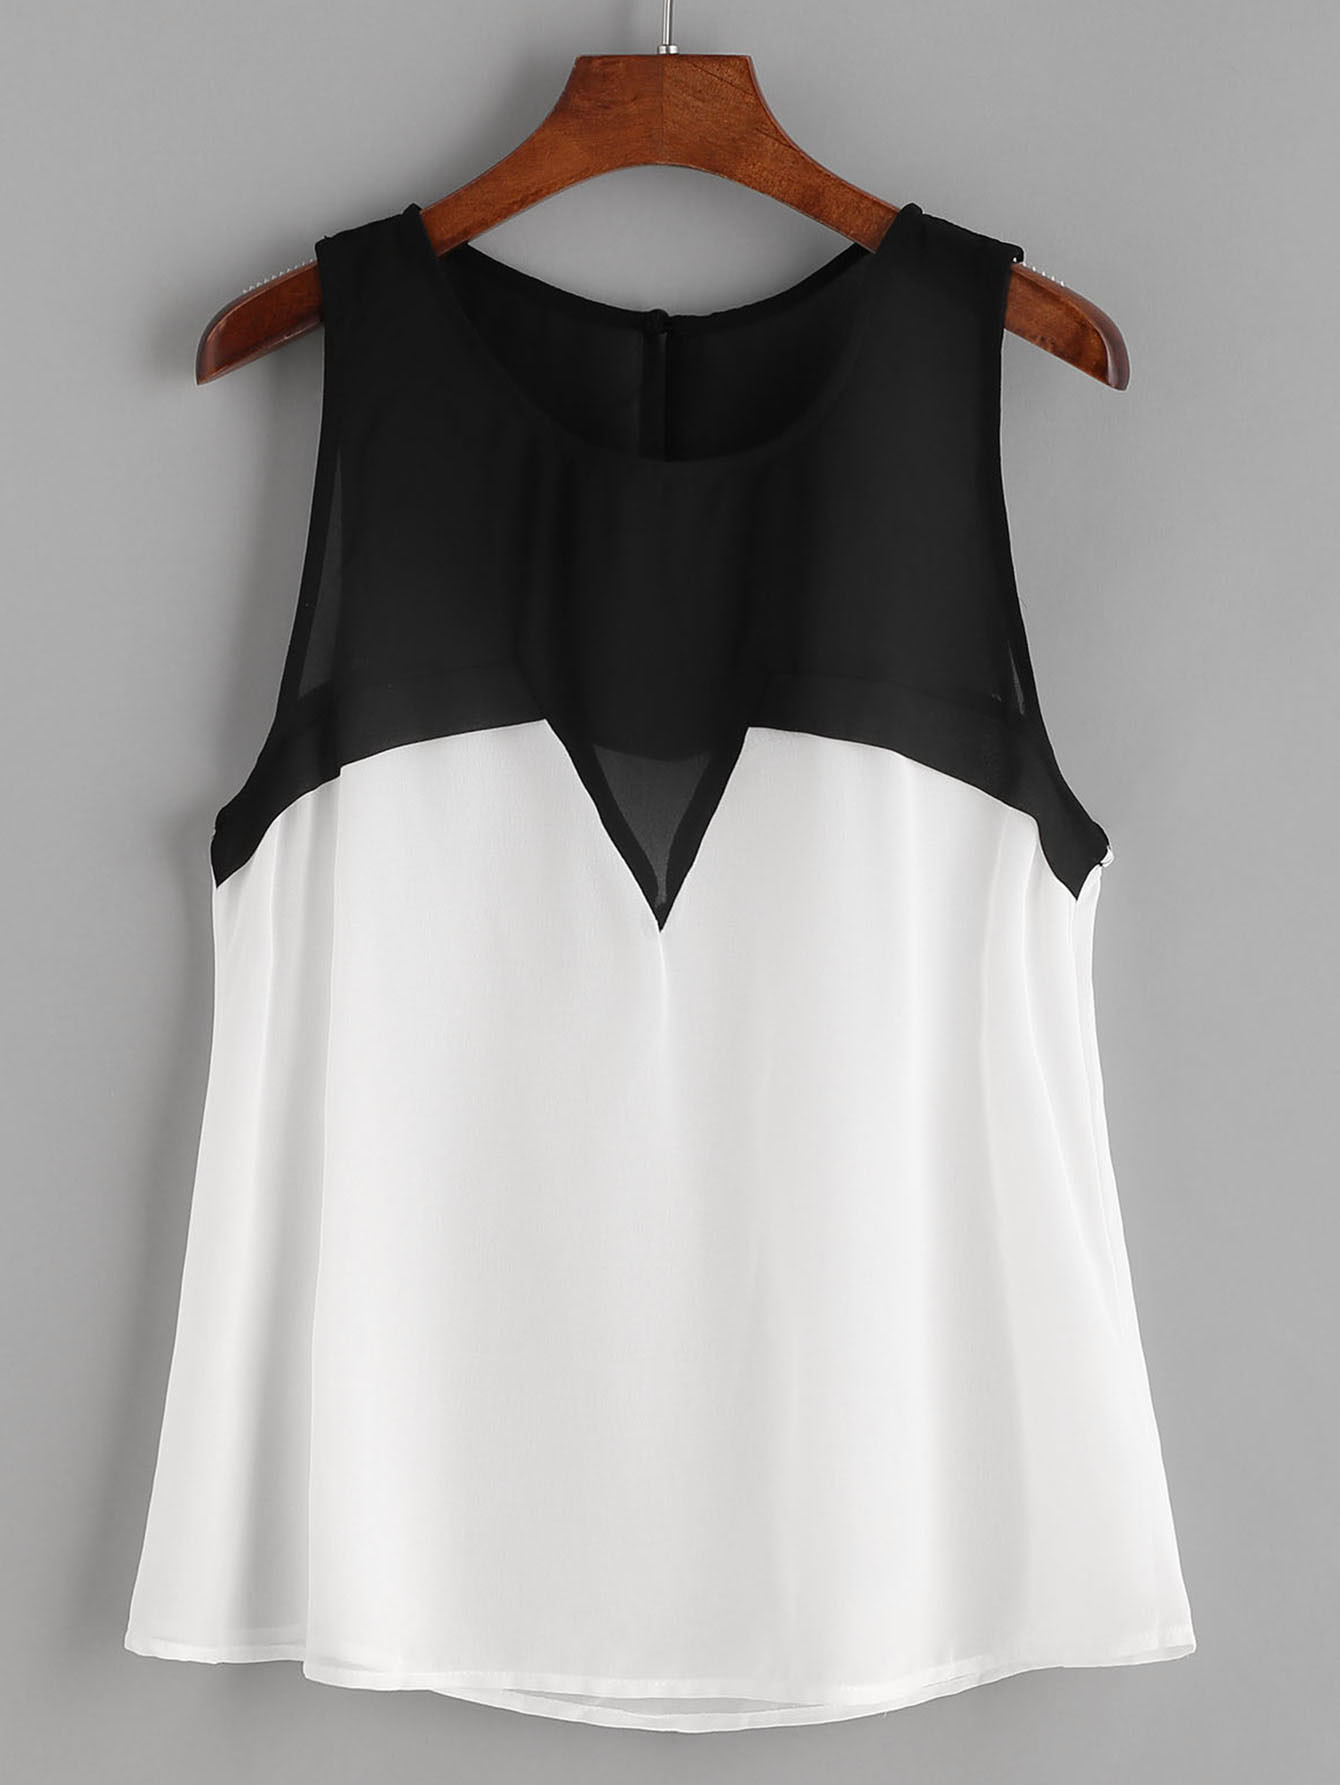 Color Block Sleeveless Chiffon Top vest170314001